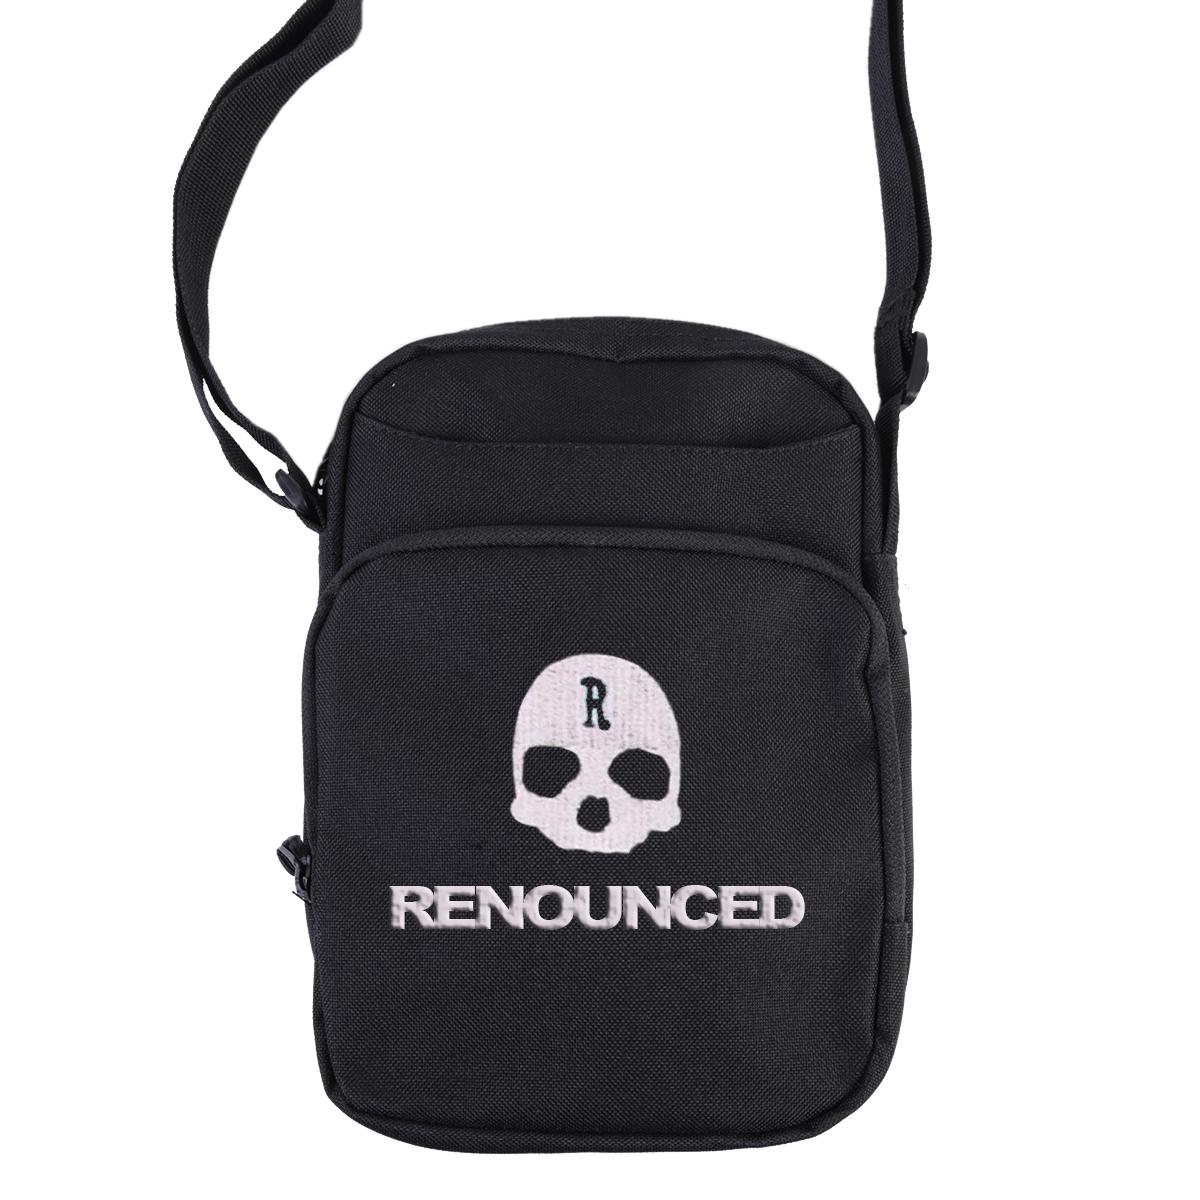 Renounced - Beauty Is A Destructive Angel body bag PREORDER